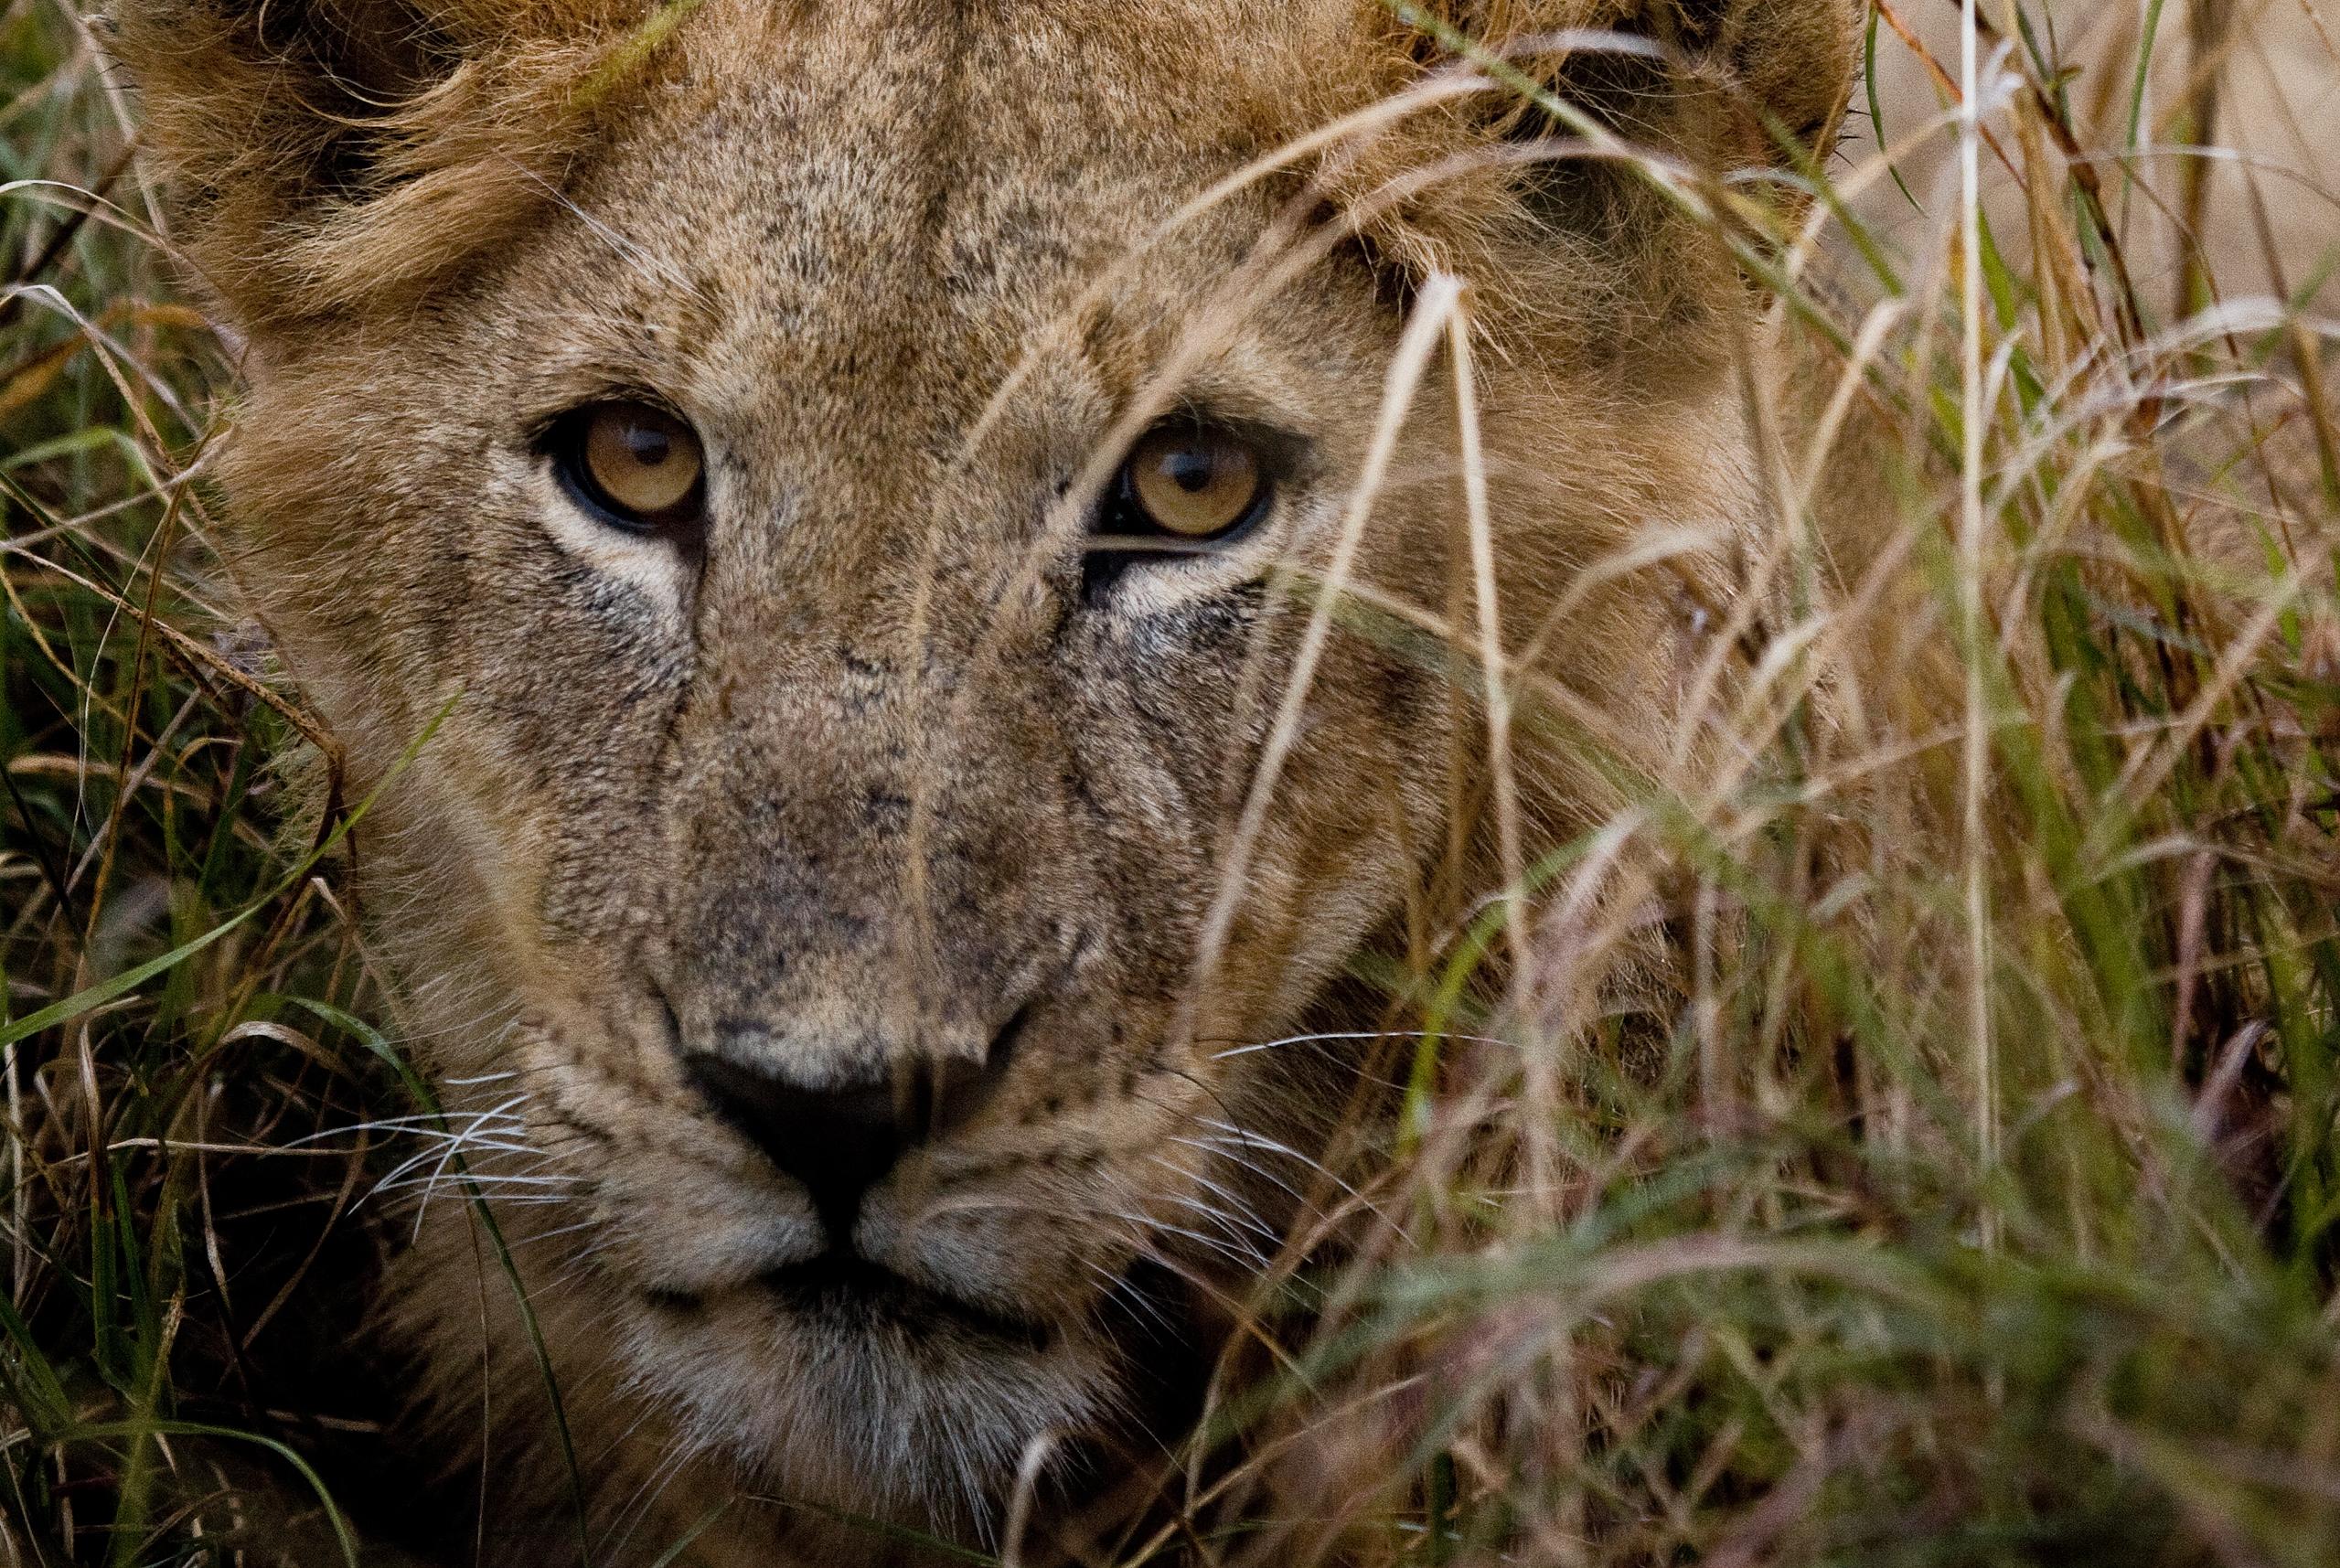 roaring_rain_lions_masai_mara_photo_by_flavio_oliva_24